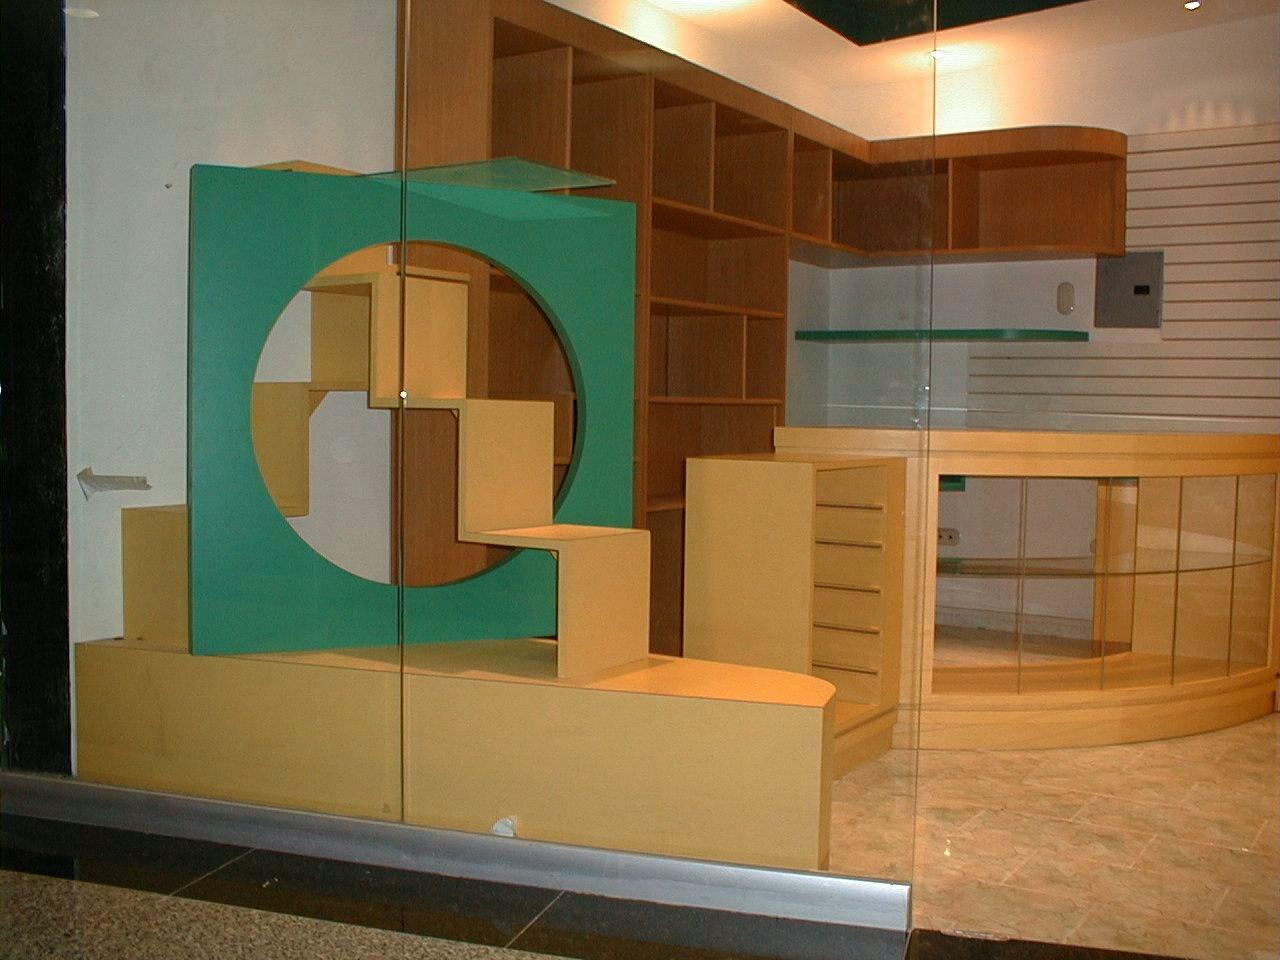 Tu consultorio oficina o local t remodela - Diseno locales comerciales ...